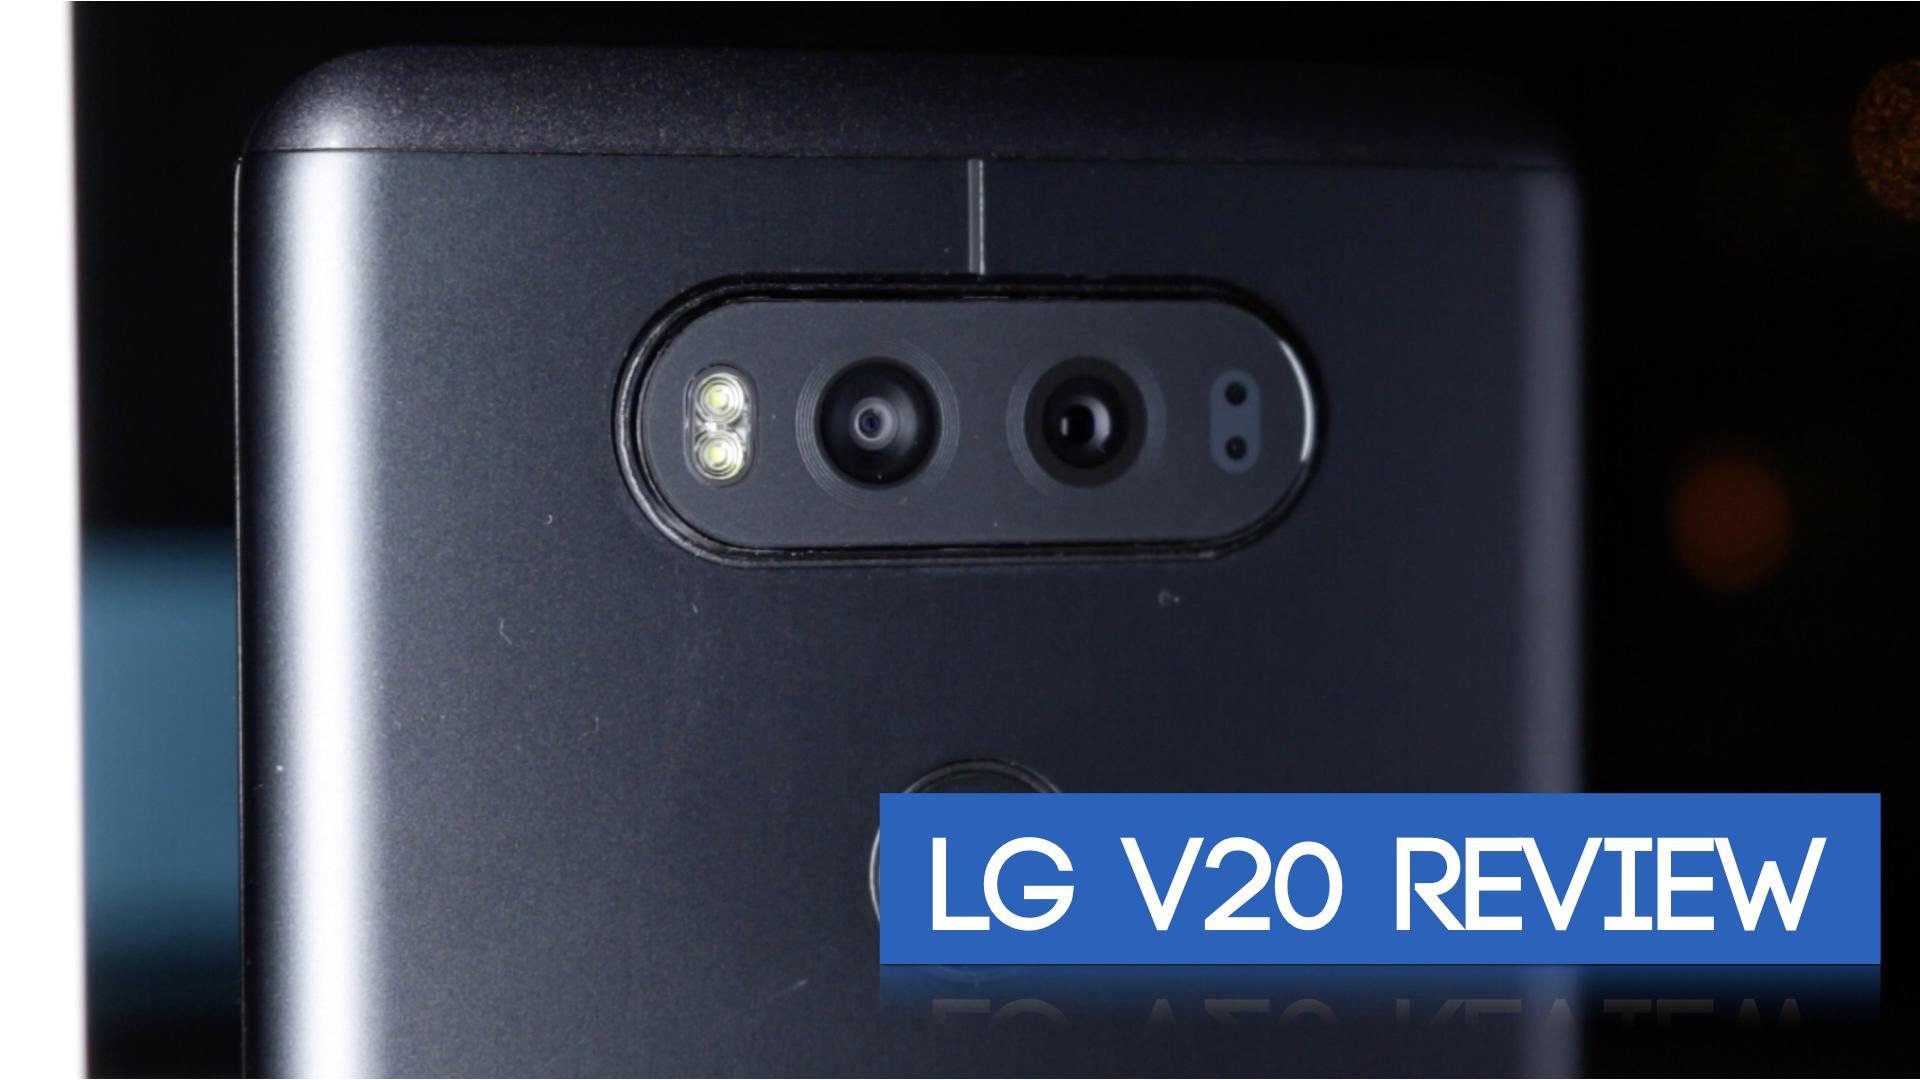 LG V20 Review Thumbnail.001